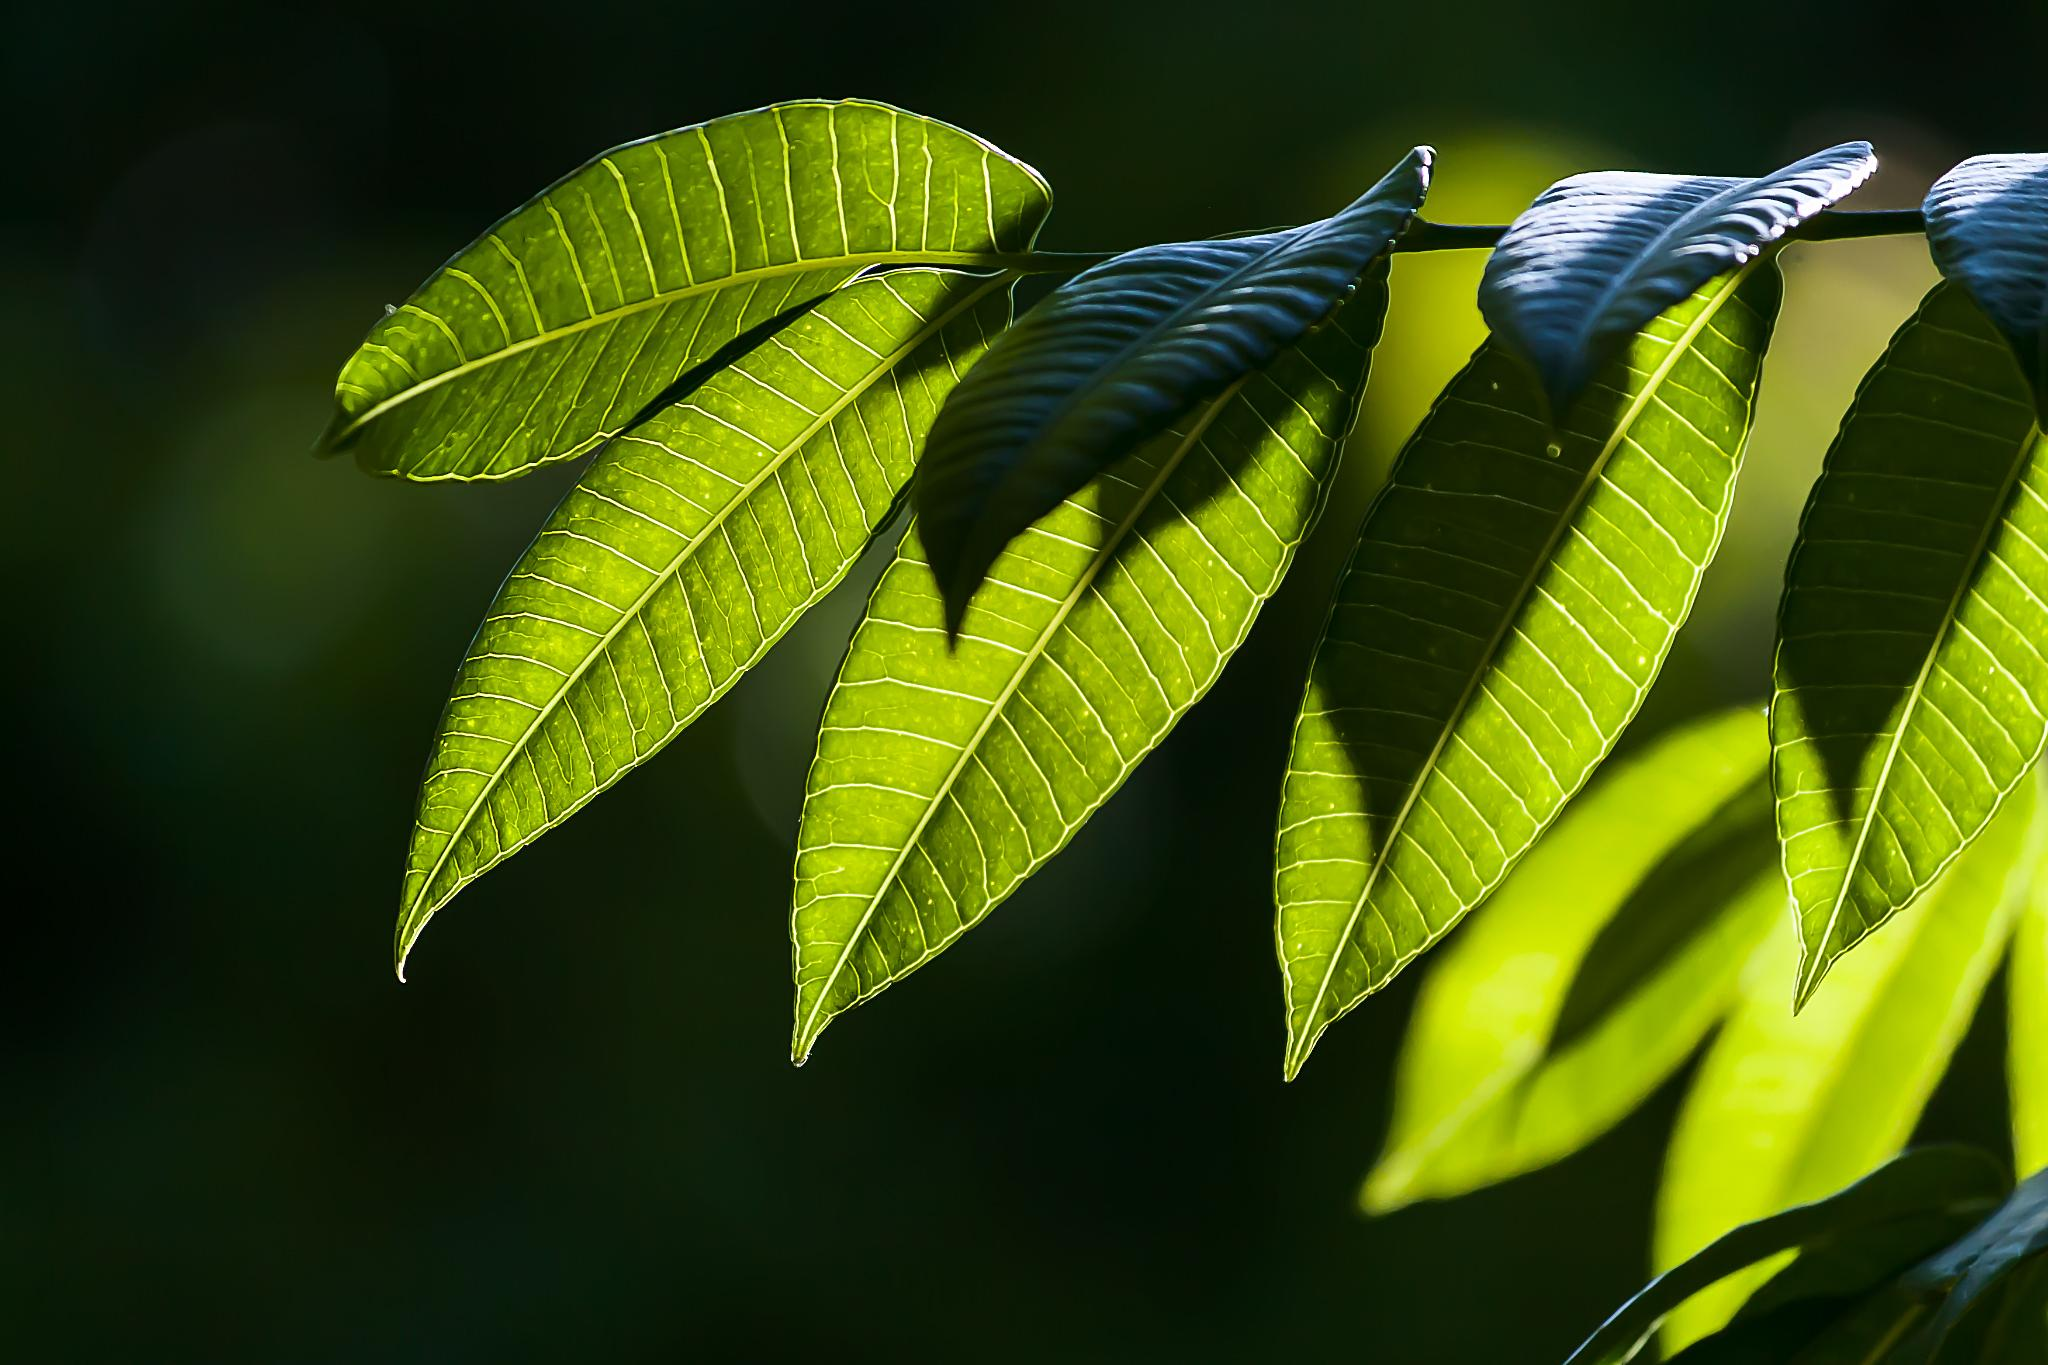 Green leaves by Tony Guzman